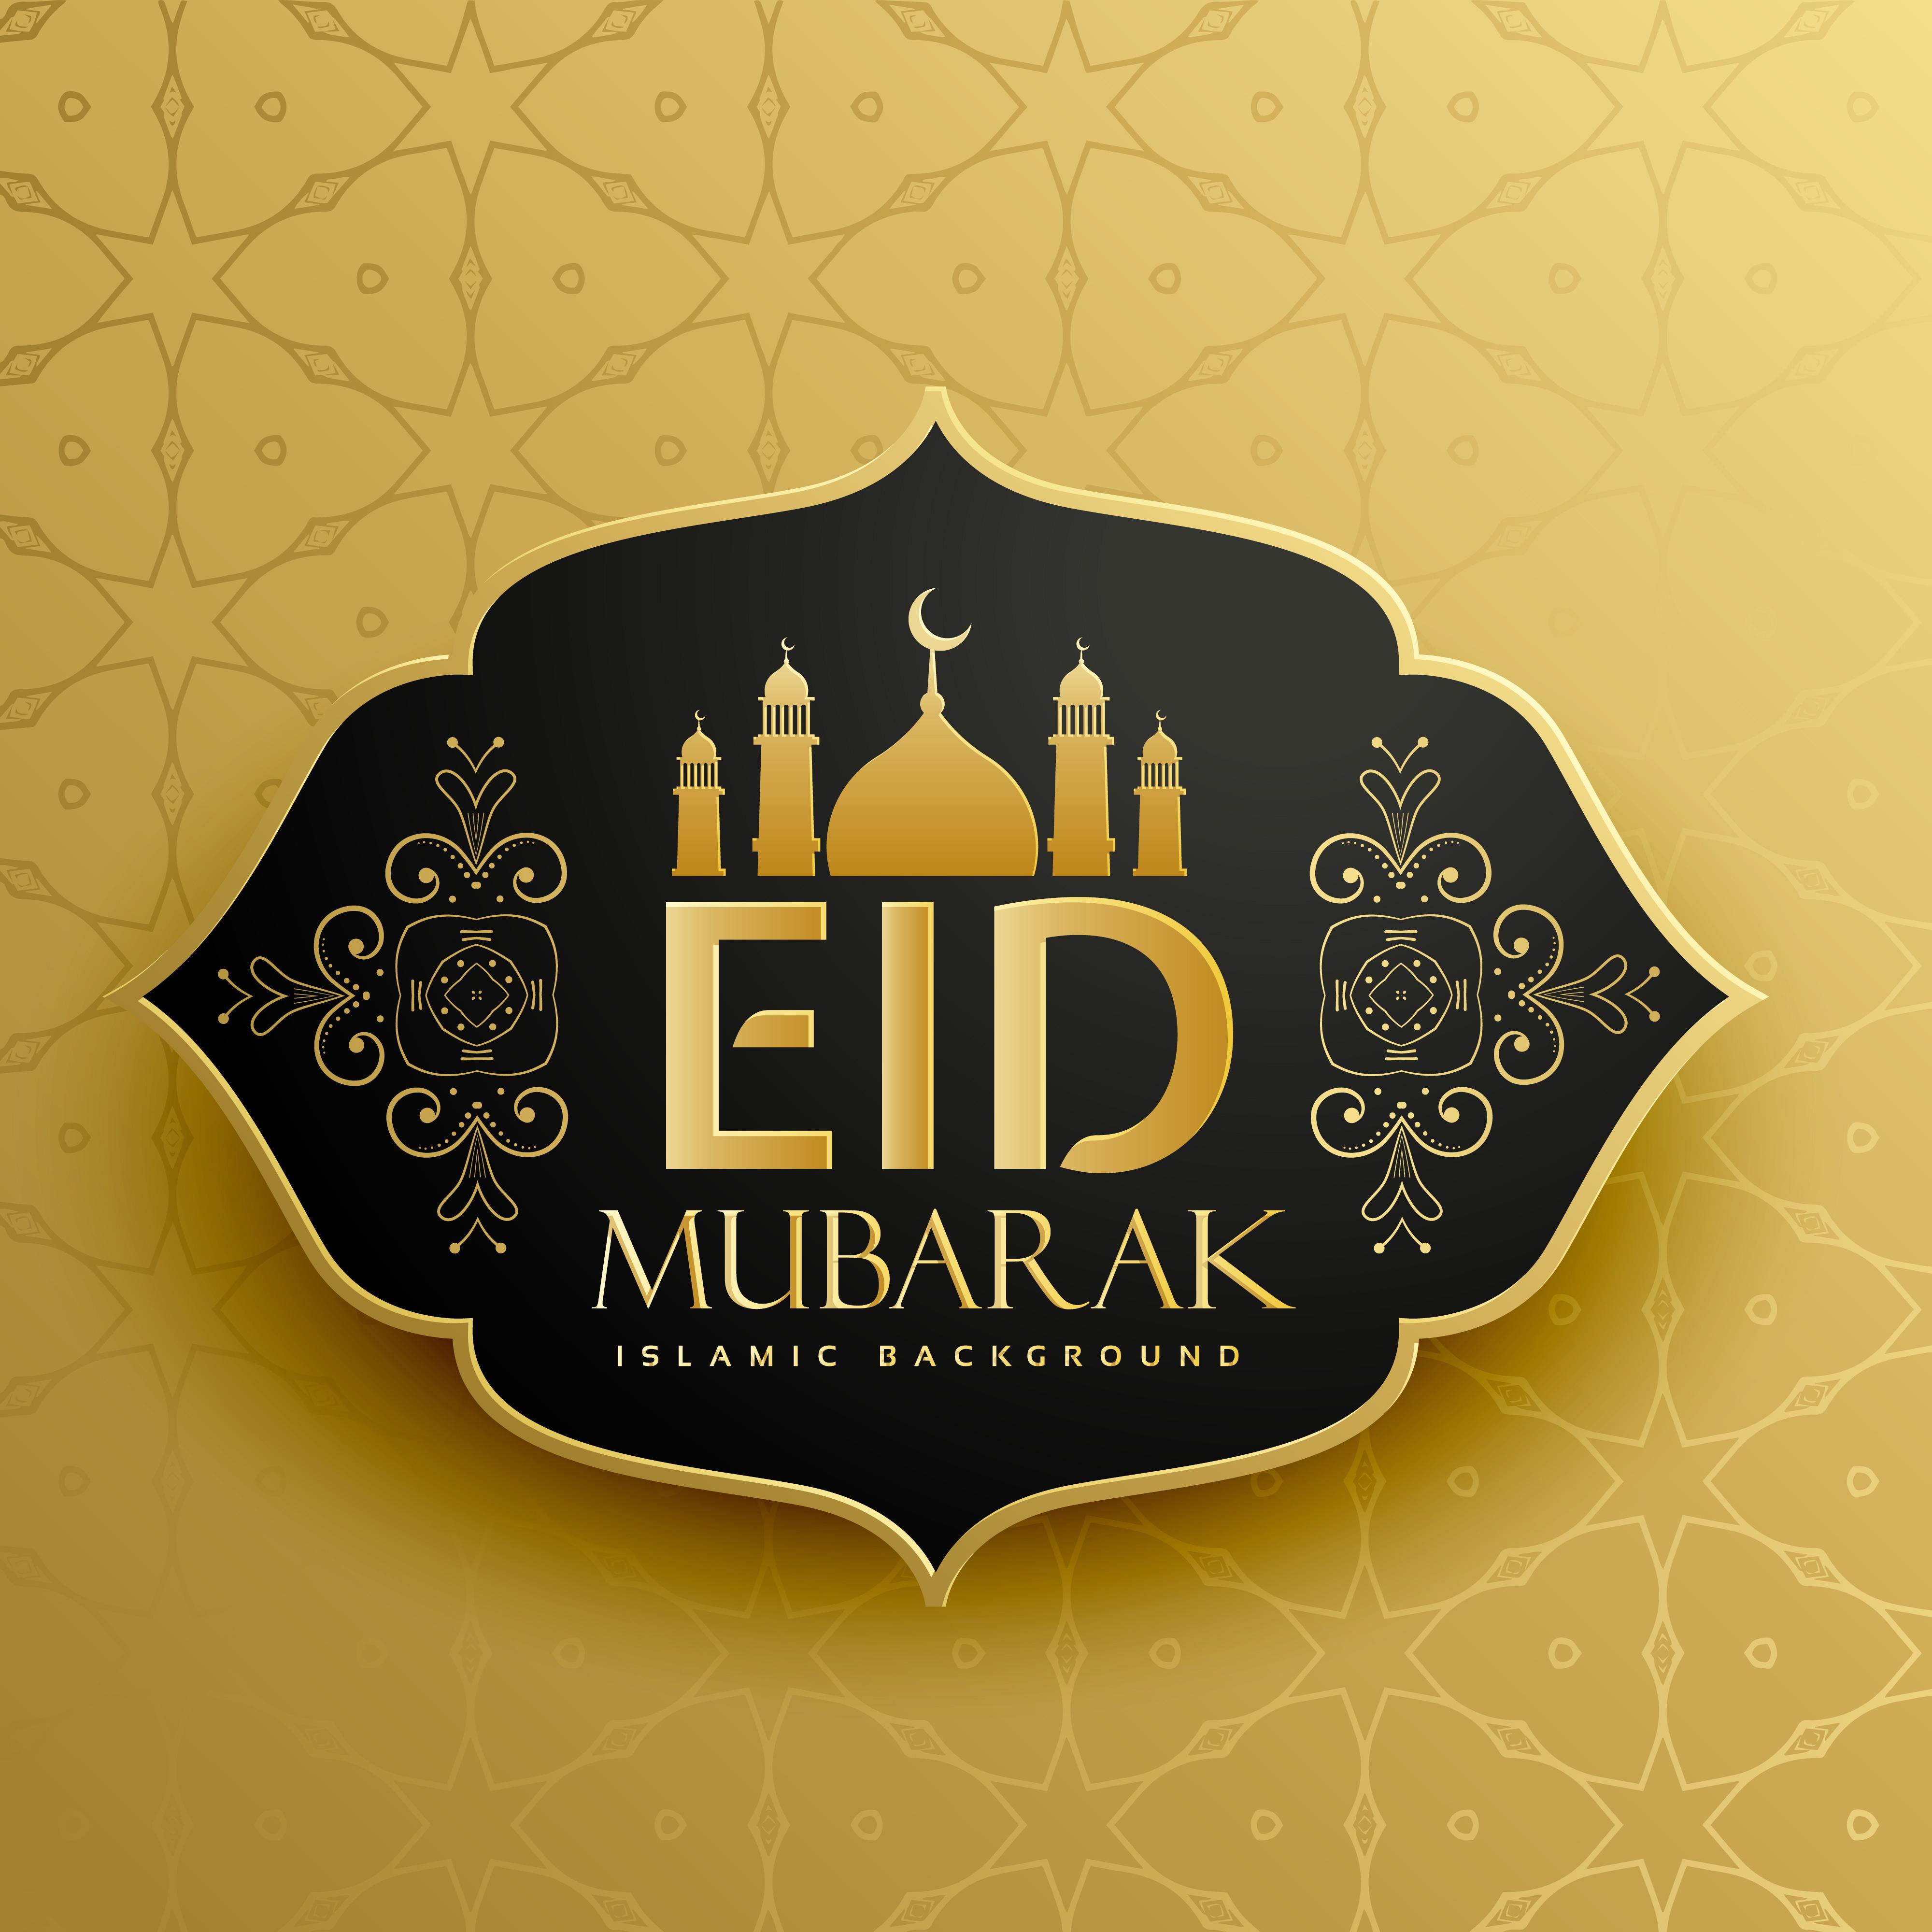 Eid Mubarak Festival Greeting In Premium Style Download